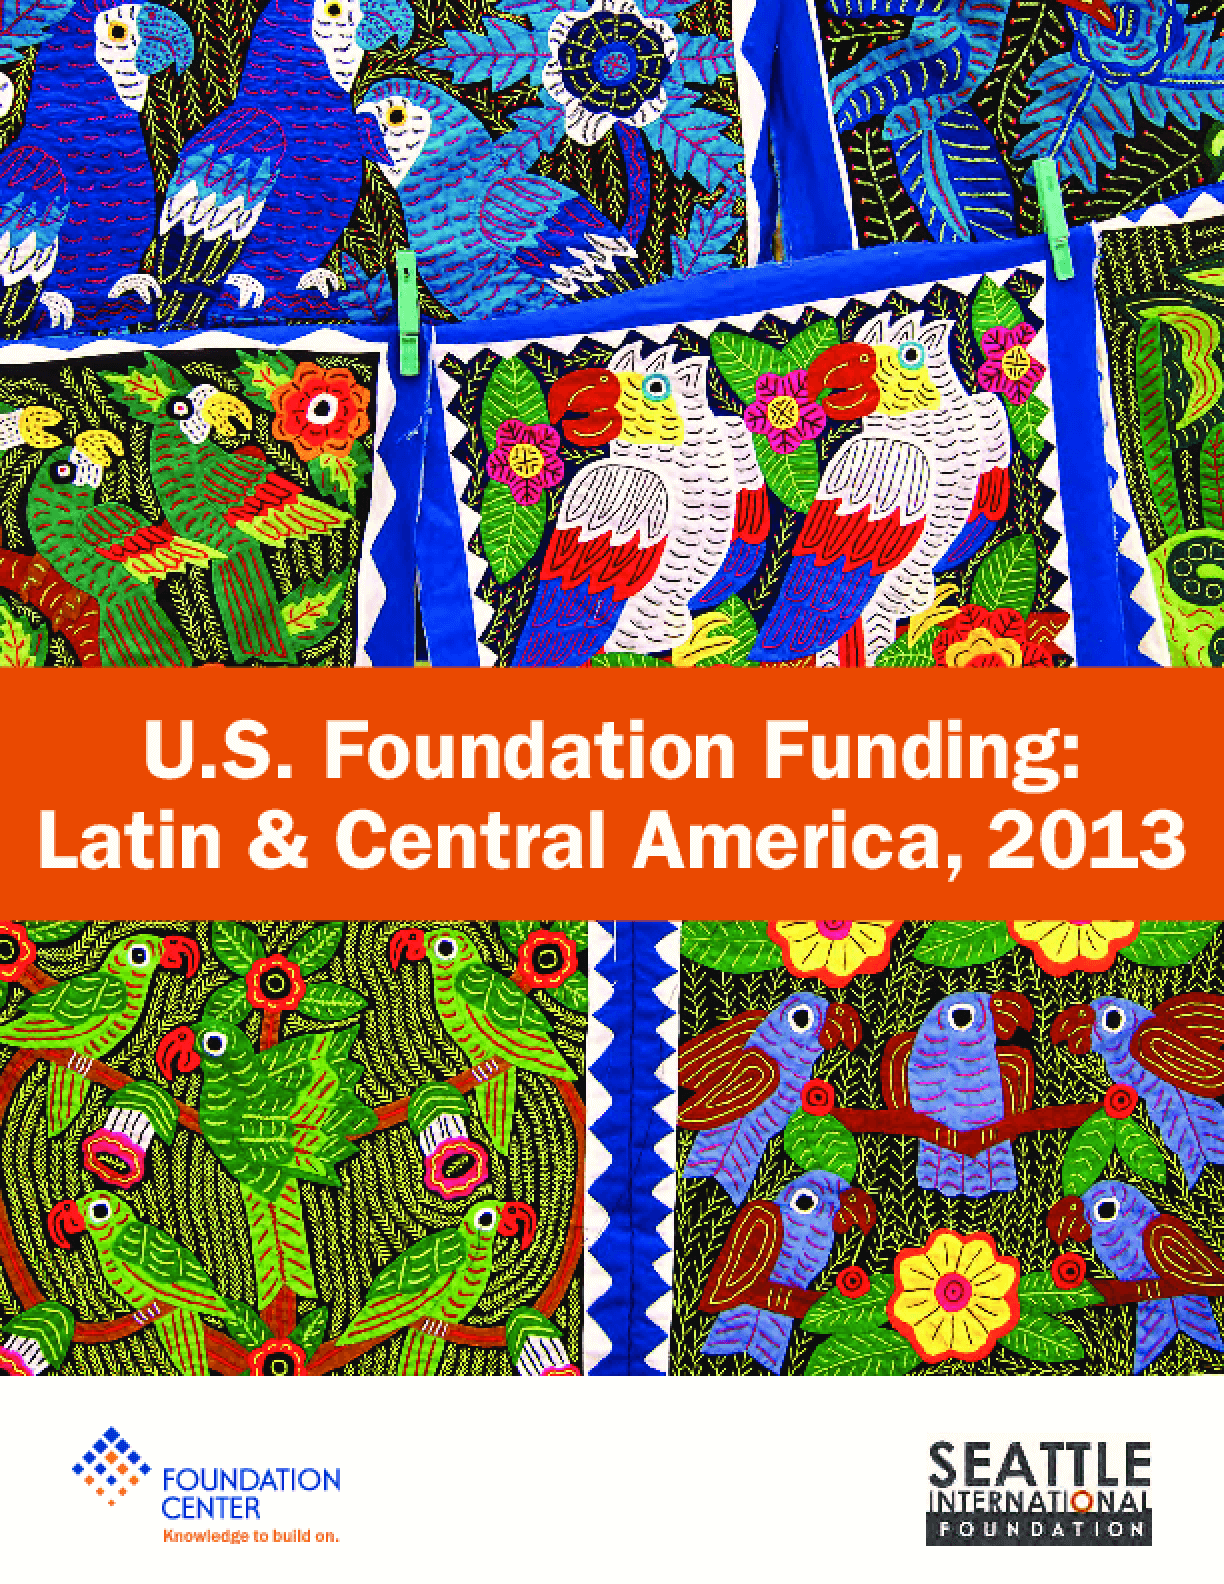 U.S. Foundation Funding: Latin & Central America, 2013